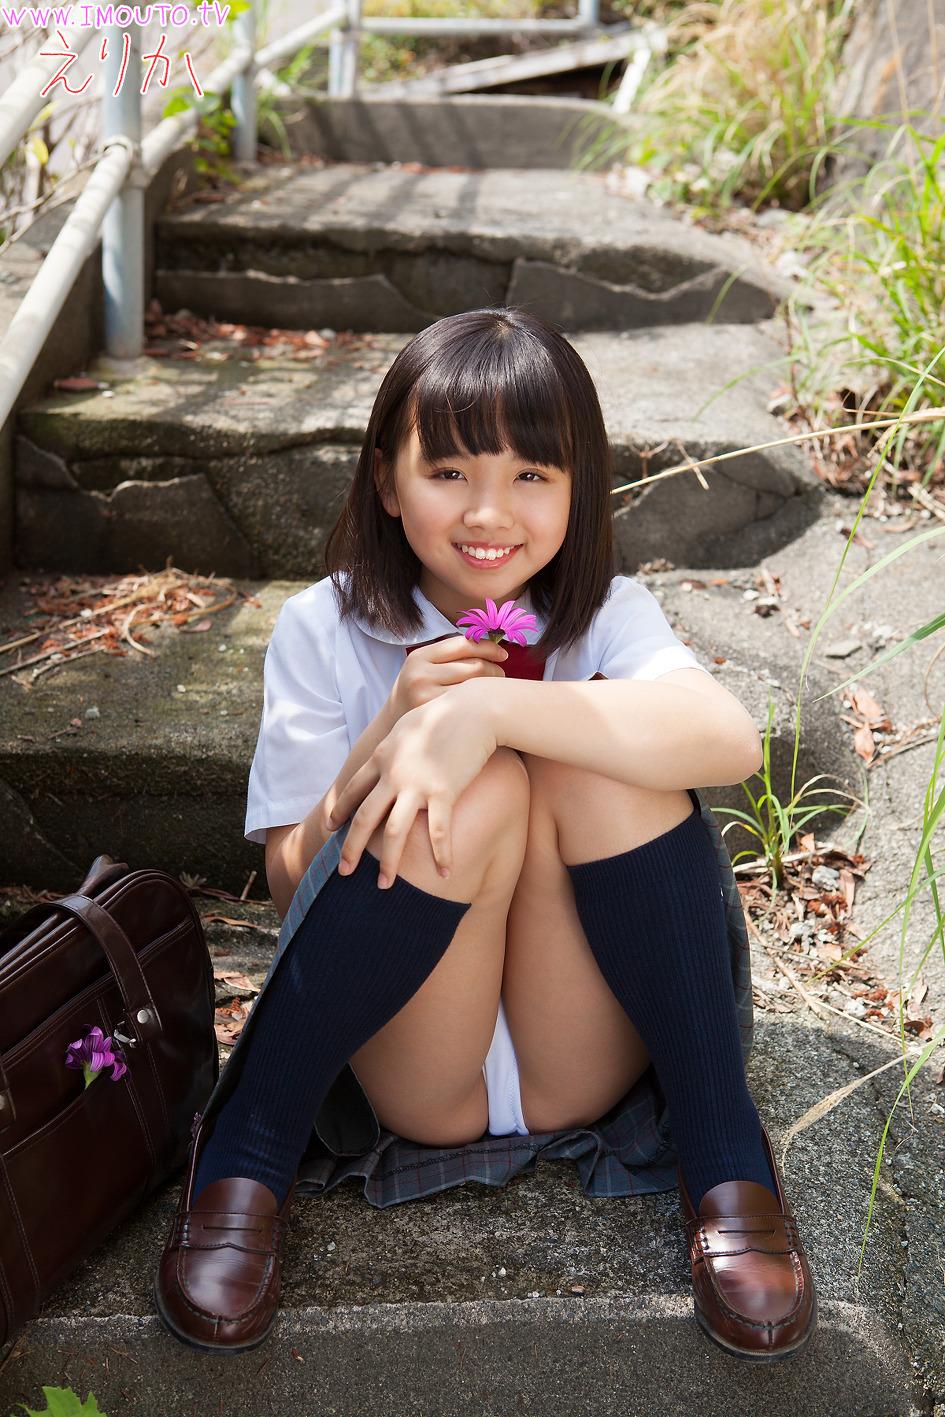 image Sexy thai girl fucks her self sweet german dirty talk